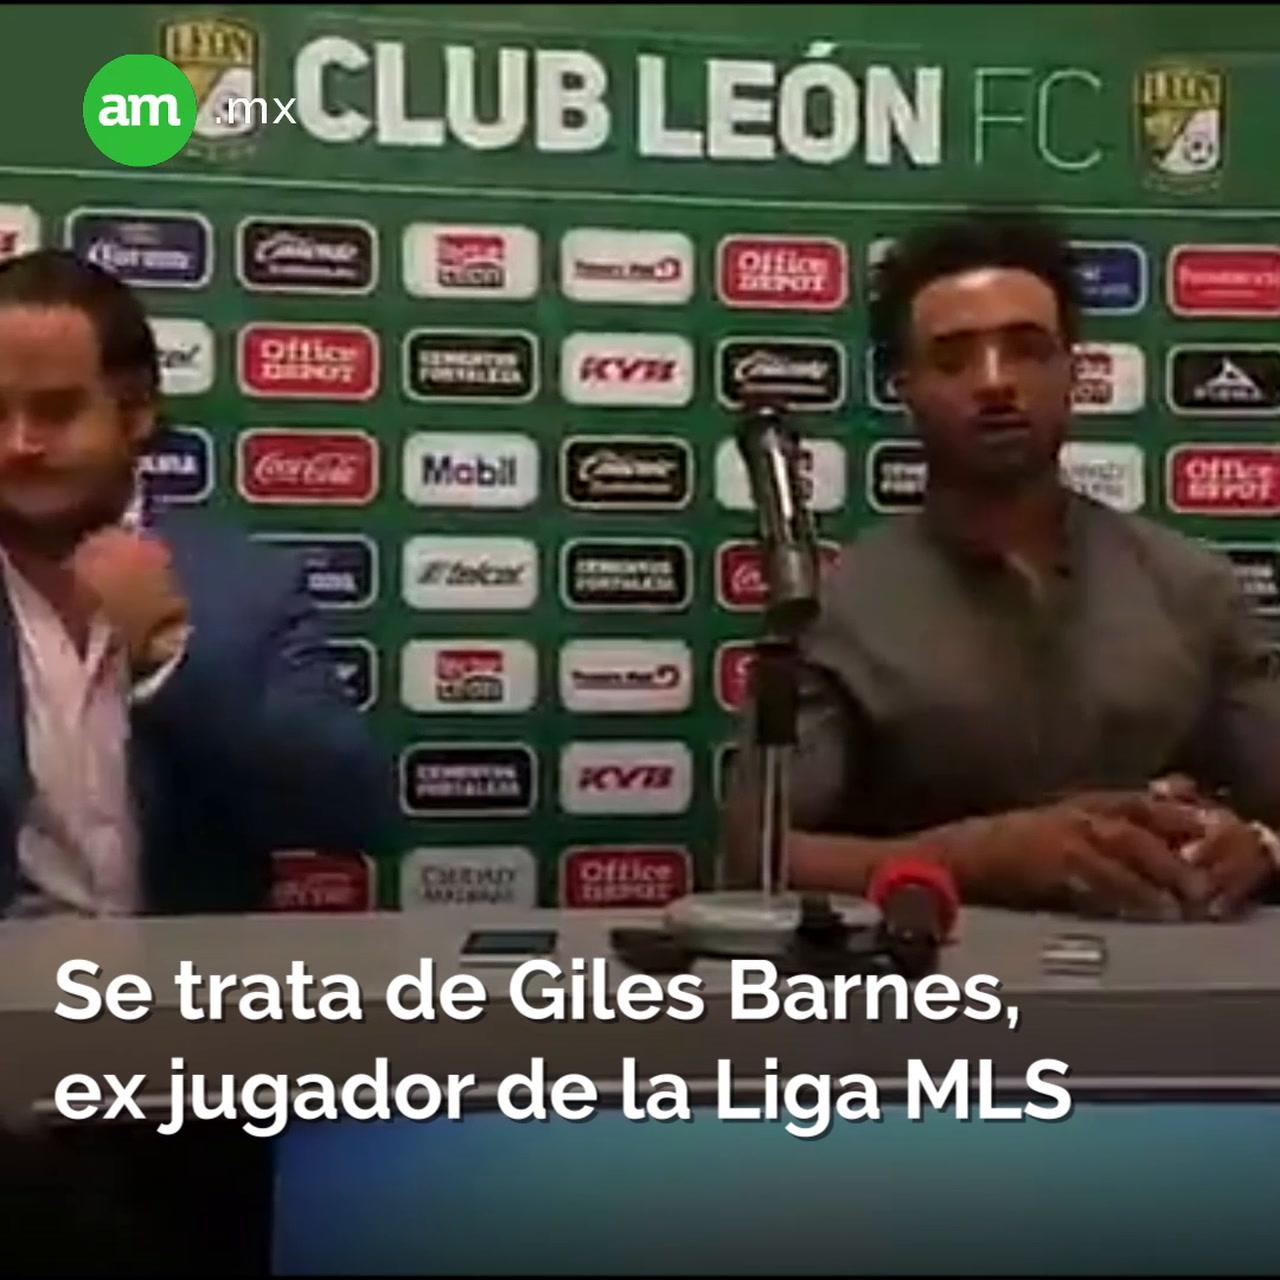 Club León presenta a Giles Barnes